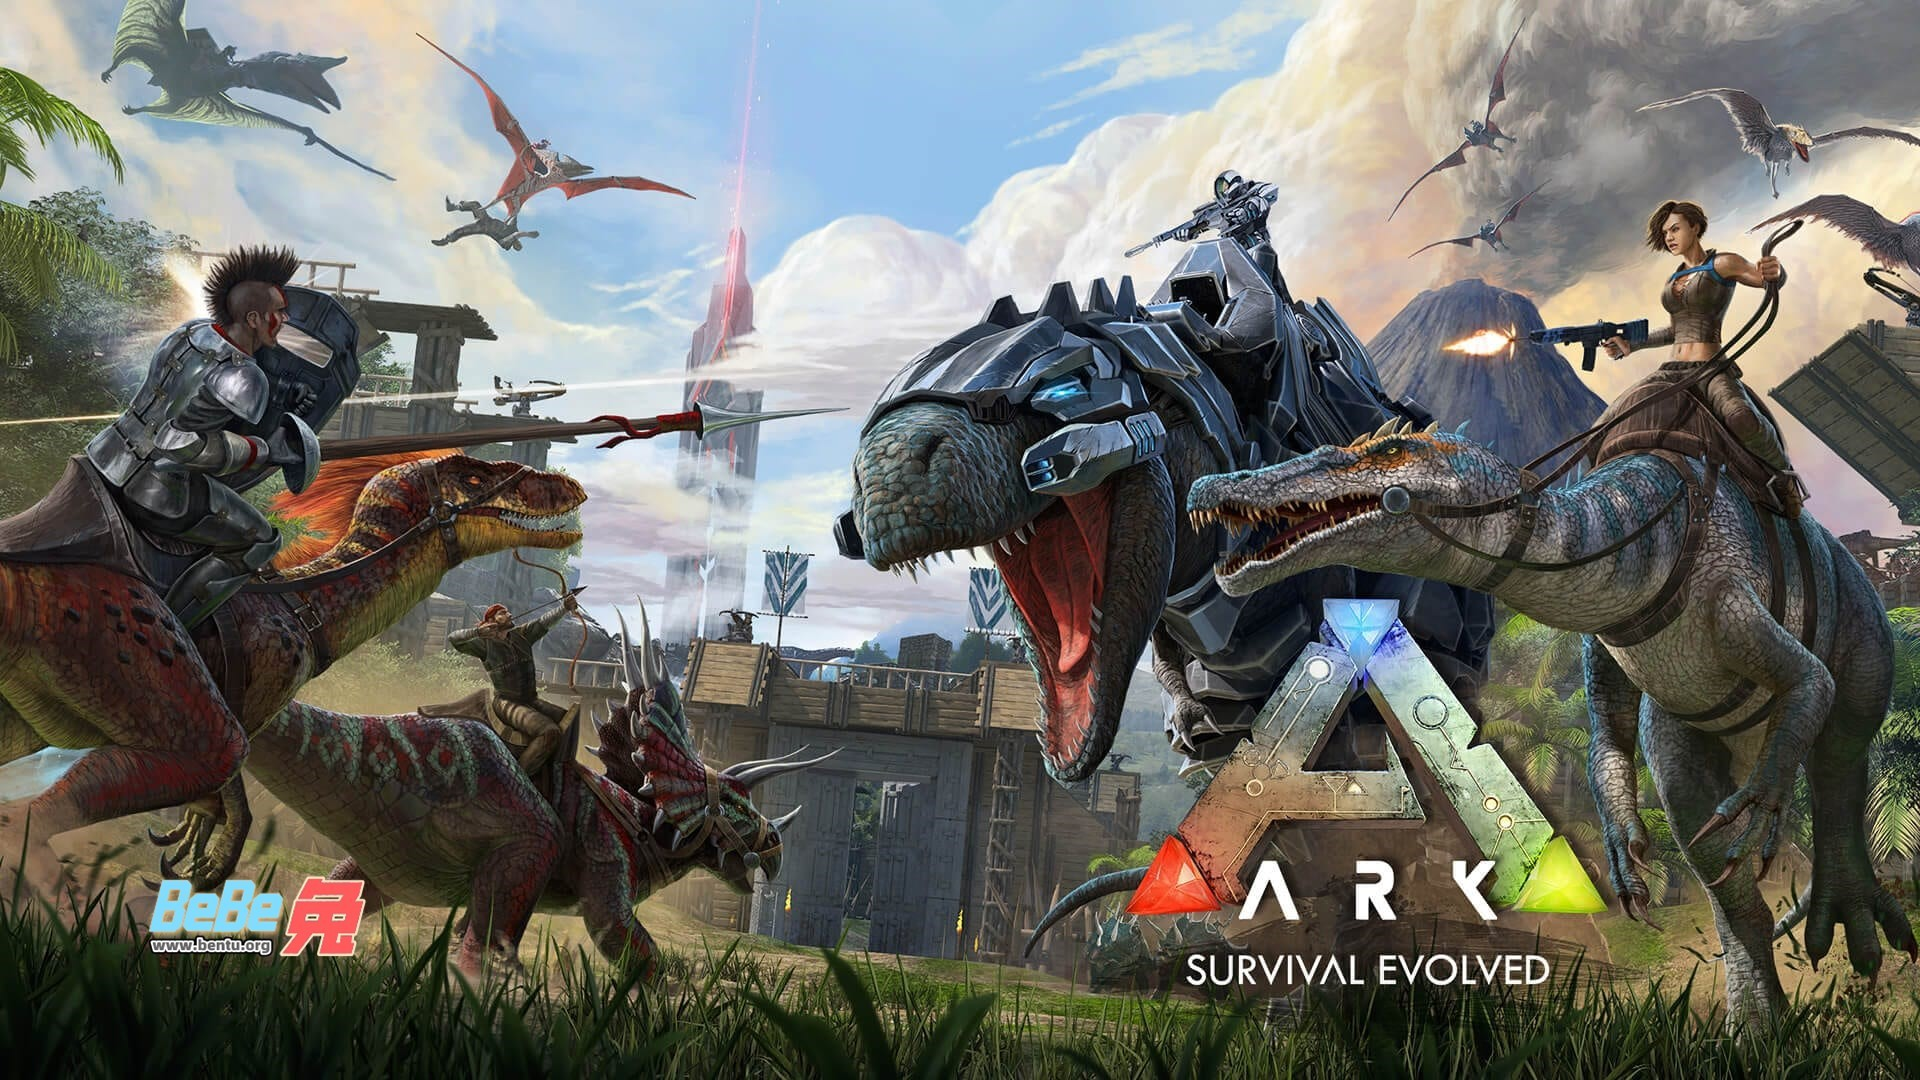 Epic平台不止喜加一,《方舟:生存进化》和《侍魂NeoGeo合集》限时免费领